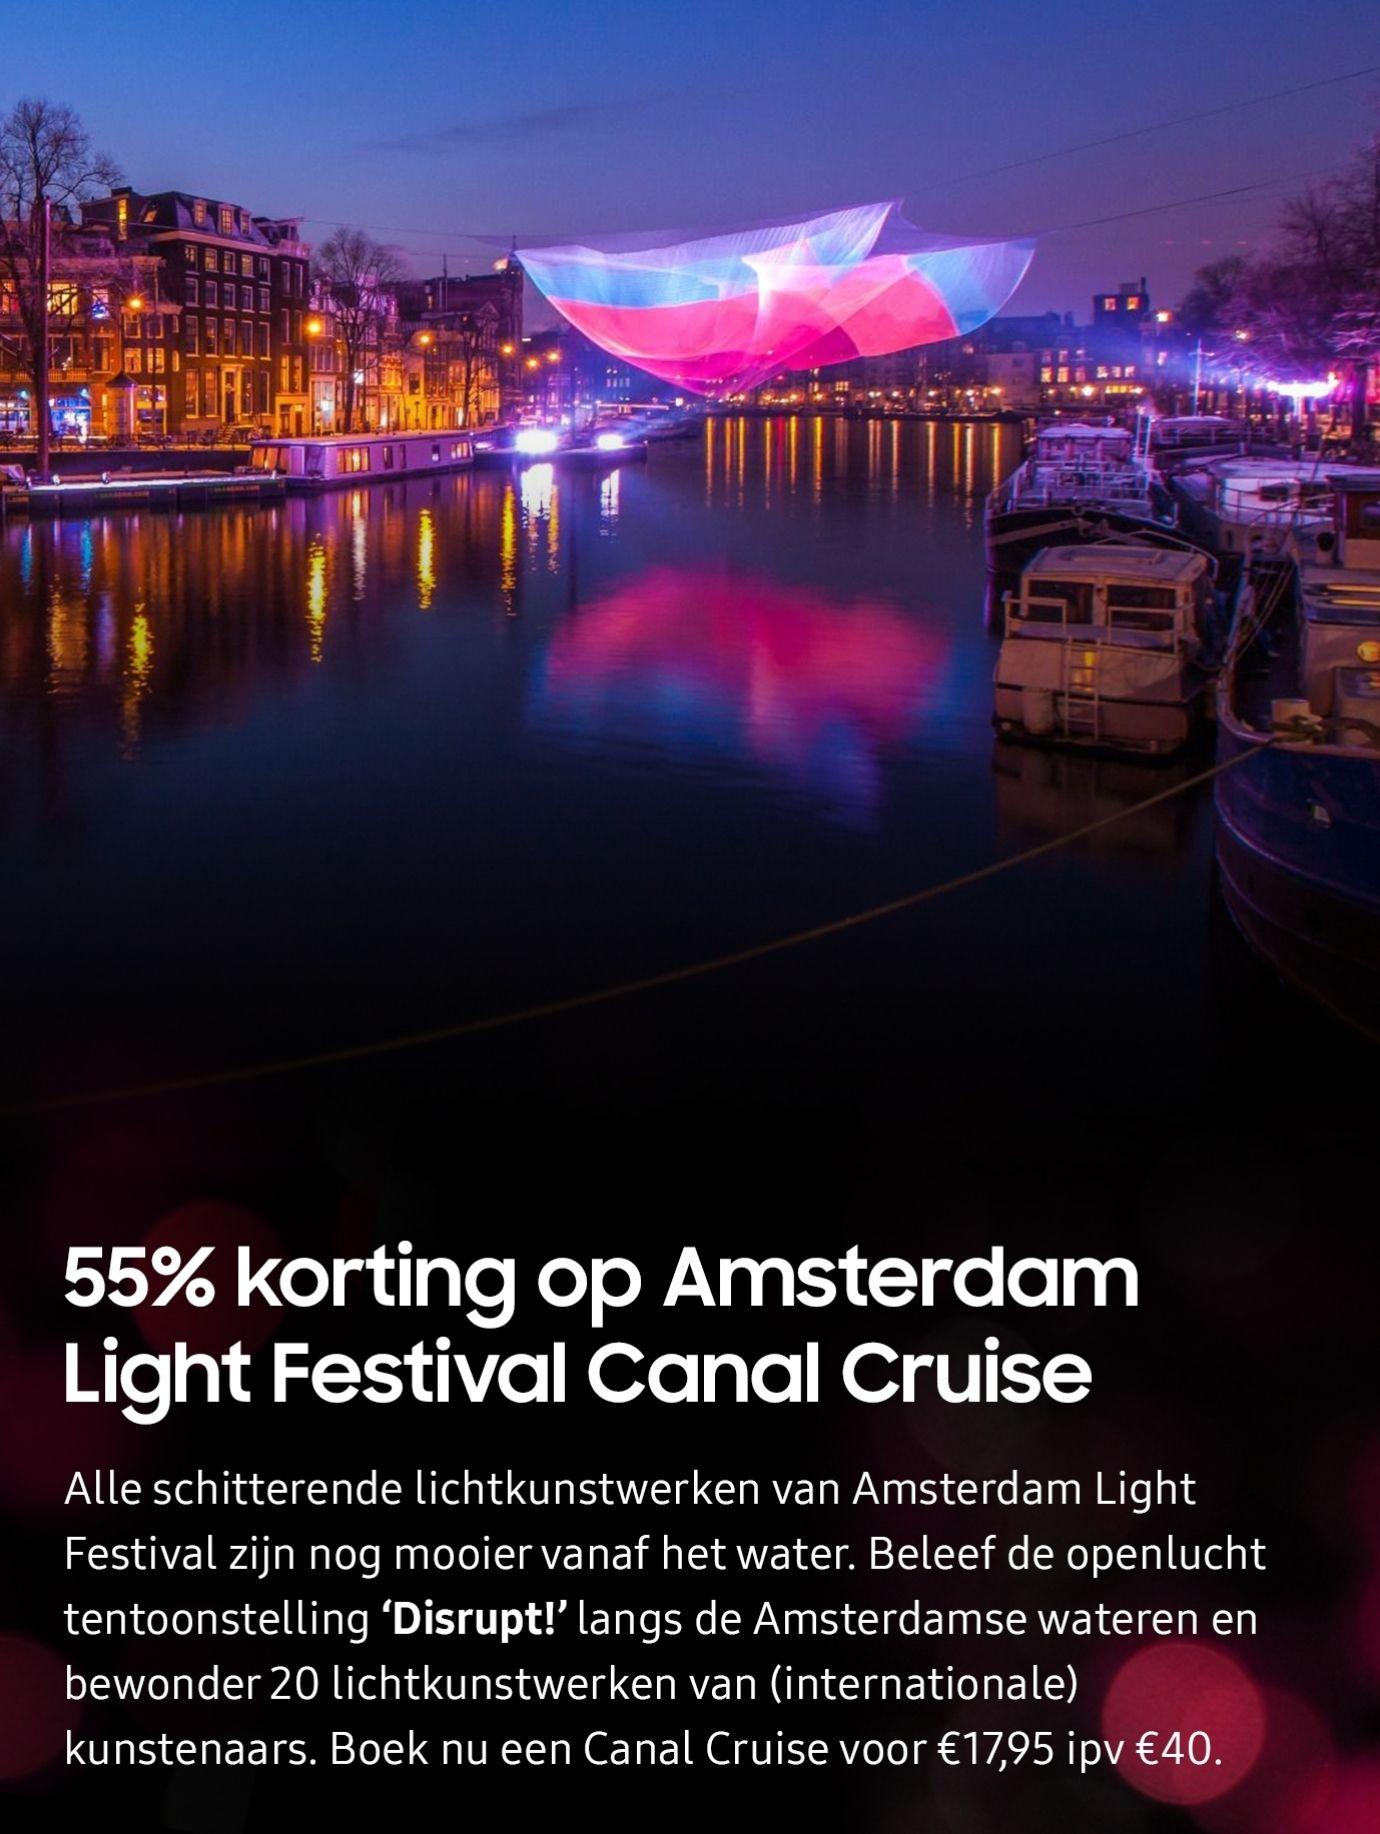 [Samsung Members] 55% korting Amsterdam Light Festival Canal Cruise